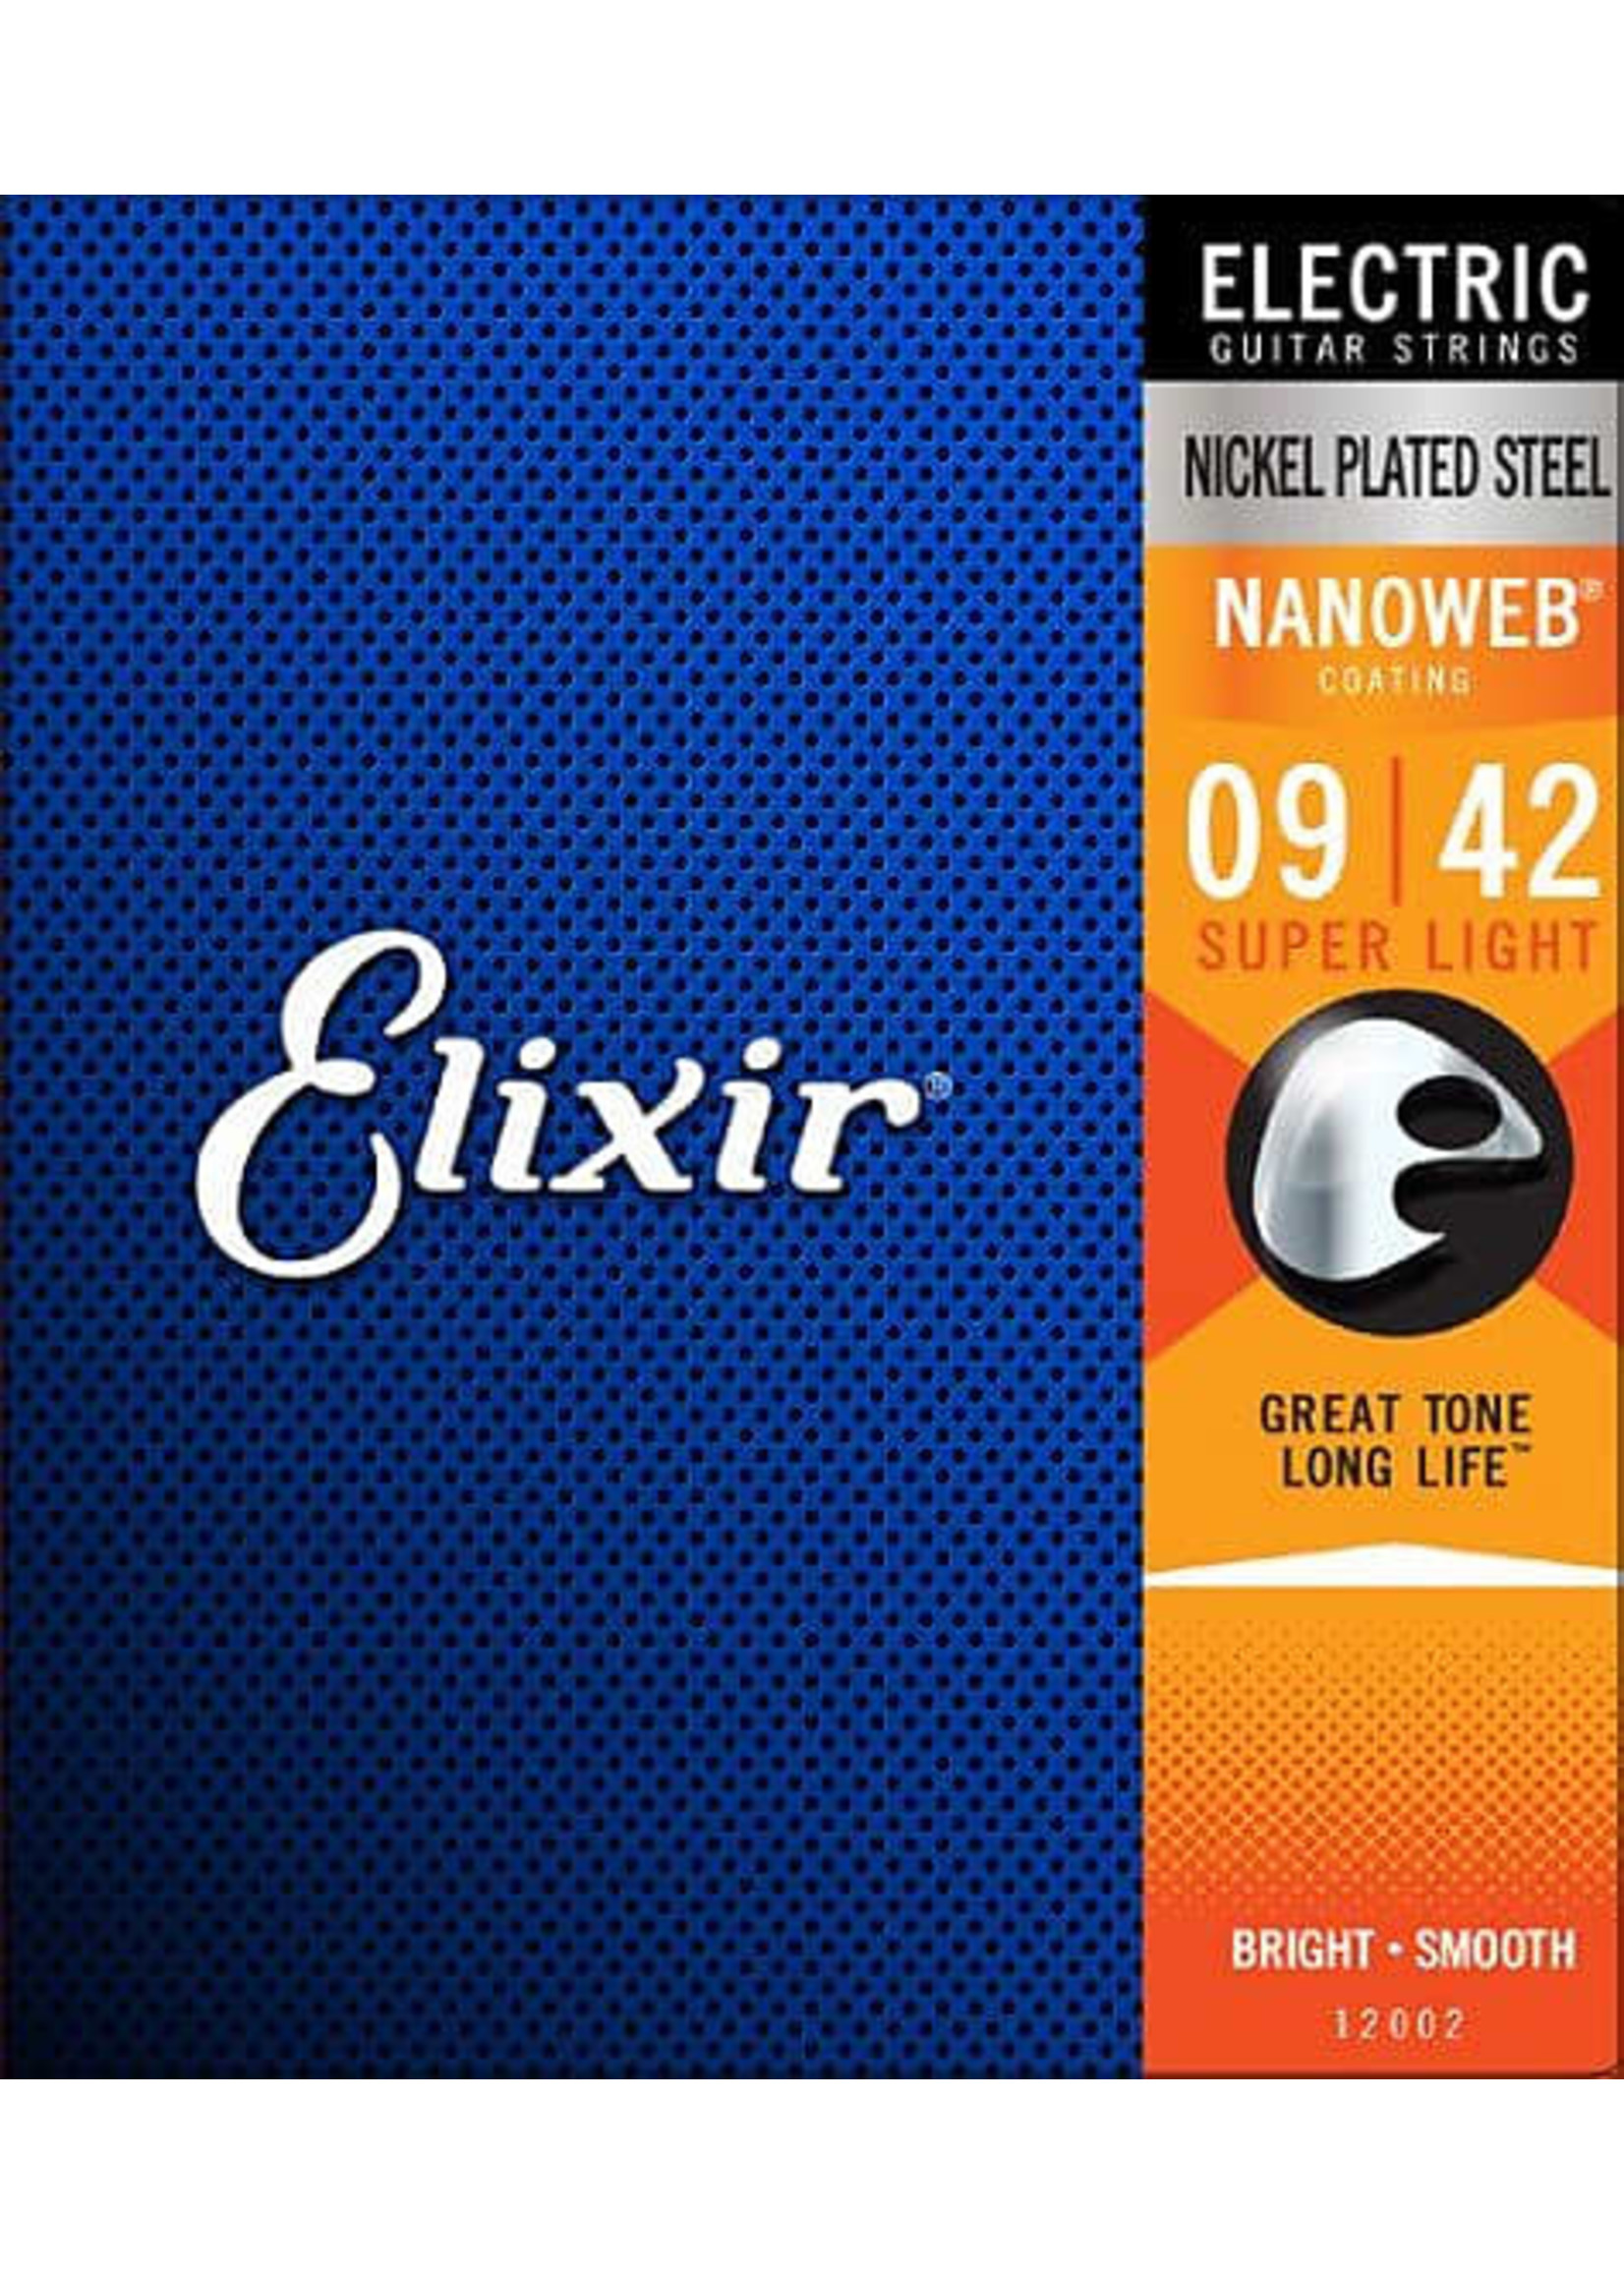 Elixir 12002 Nanoweb Coated Electric Guitar Strings 9-42